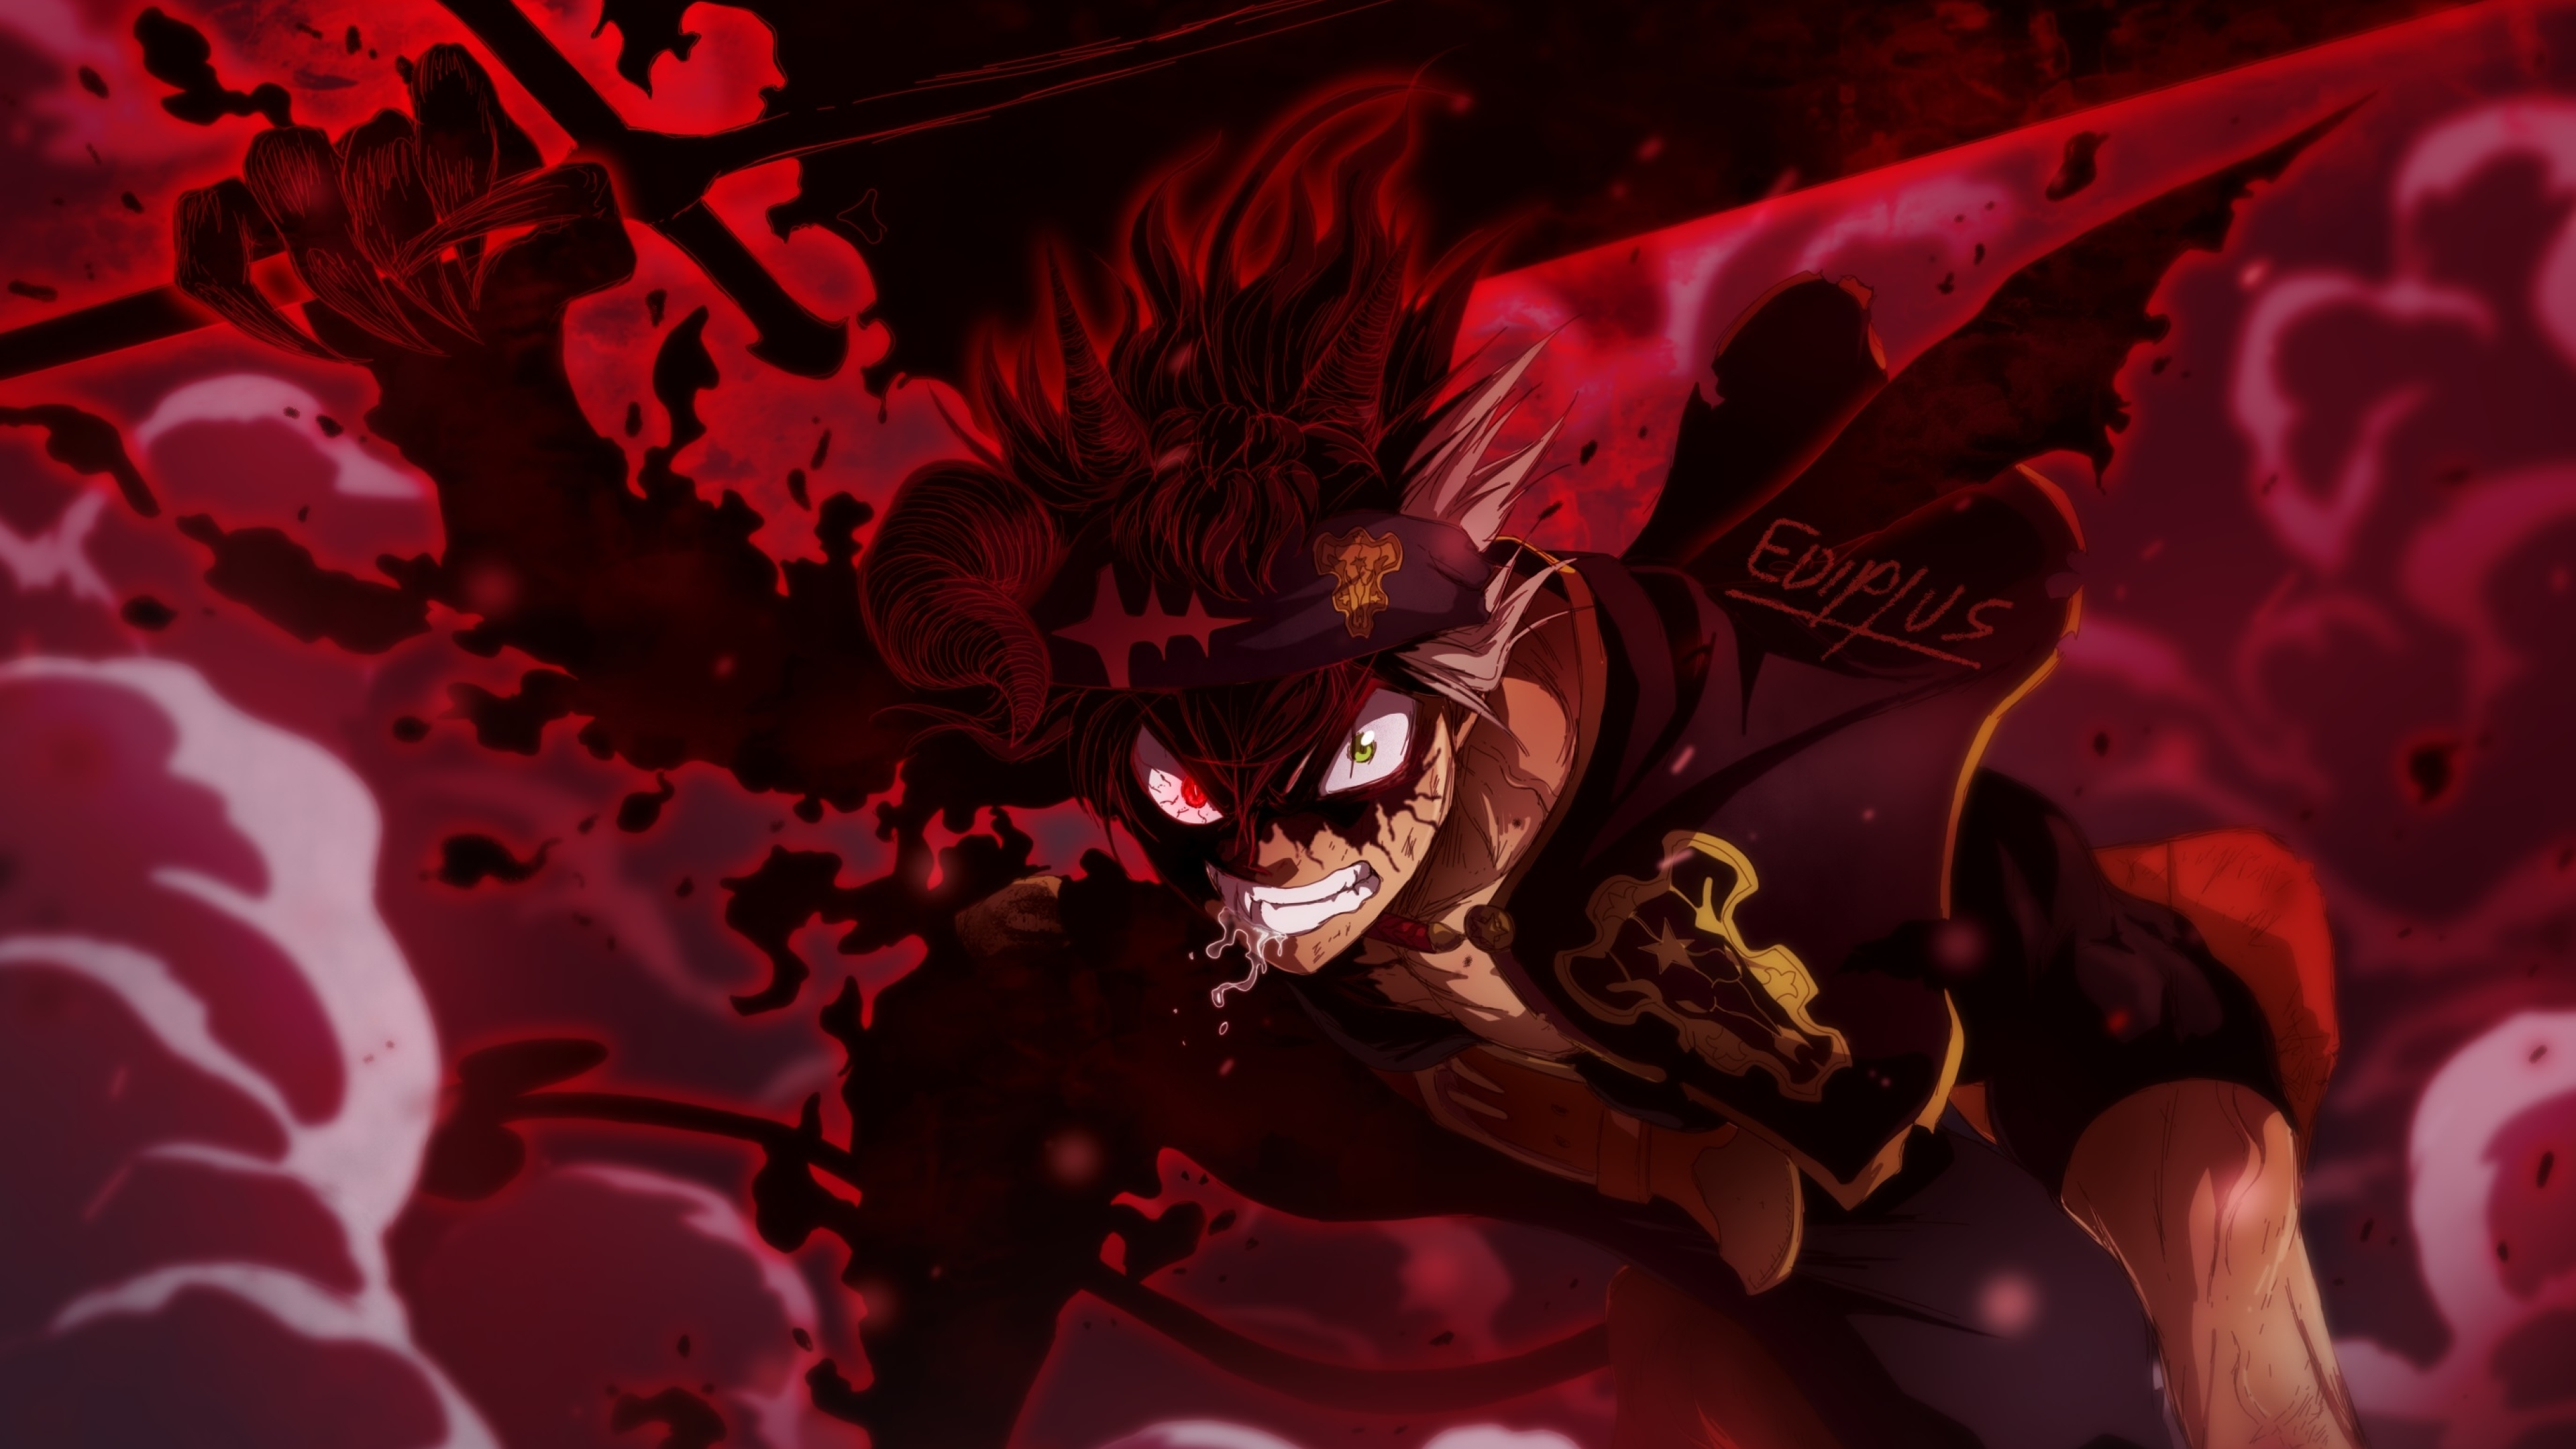 3840x2160 Asta in Black Clover 4K Wallpaper, HD Anime 4K ...